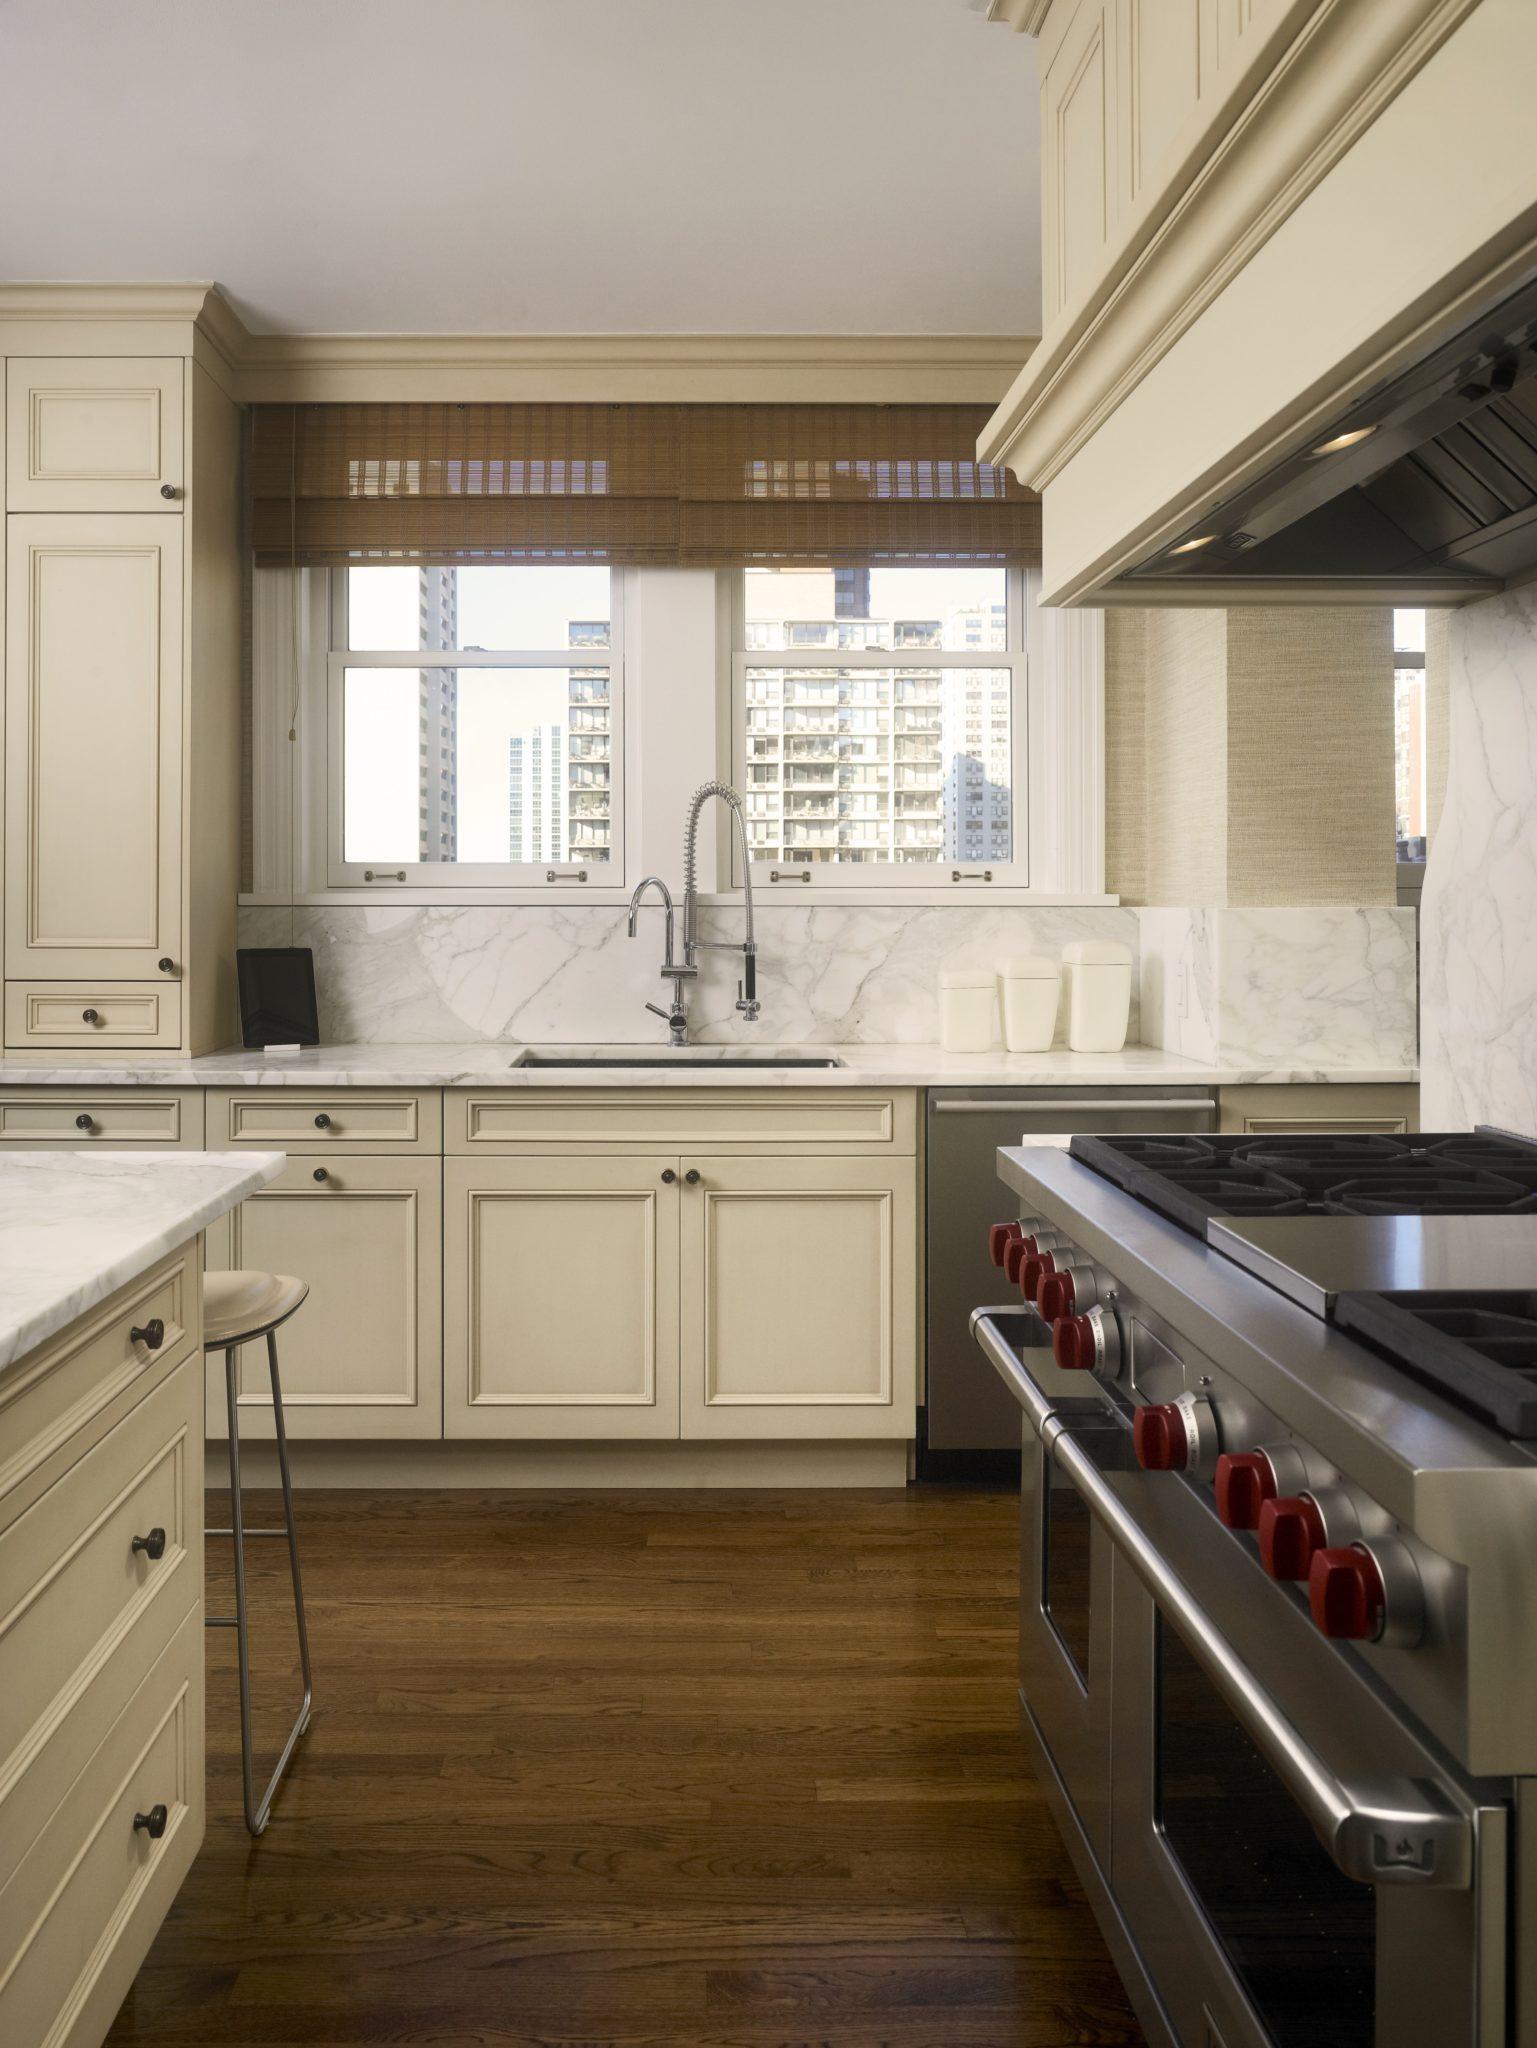 Chicago, Illinois, Gold Coast pre-war co-op apartment by Vincere, Ltd.